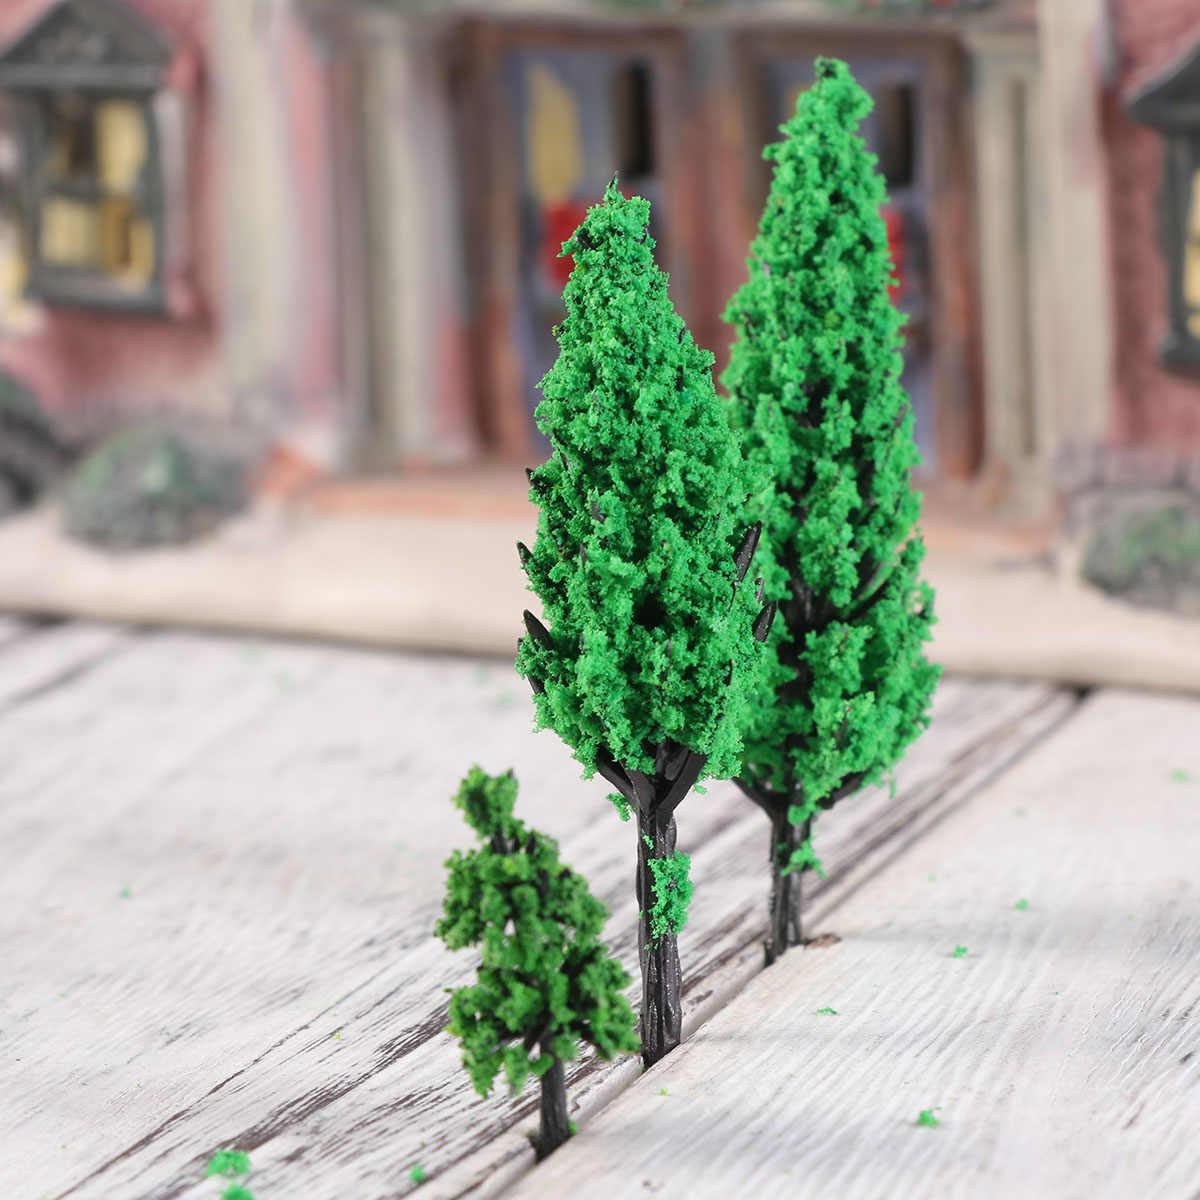 50 Uds. Modelo de parque de árboles Pino Álamo bosque Pagoda miniatura Diorama Micro diseño paisaje decoración mininaturas